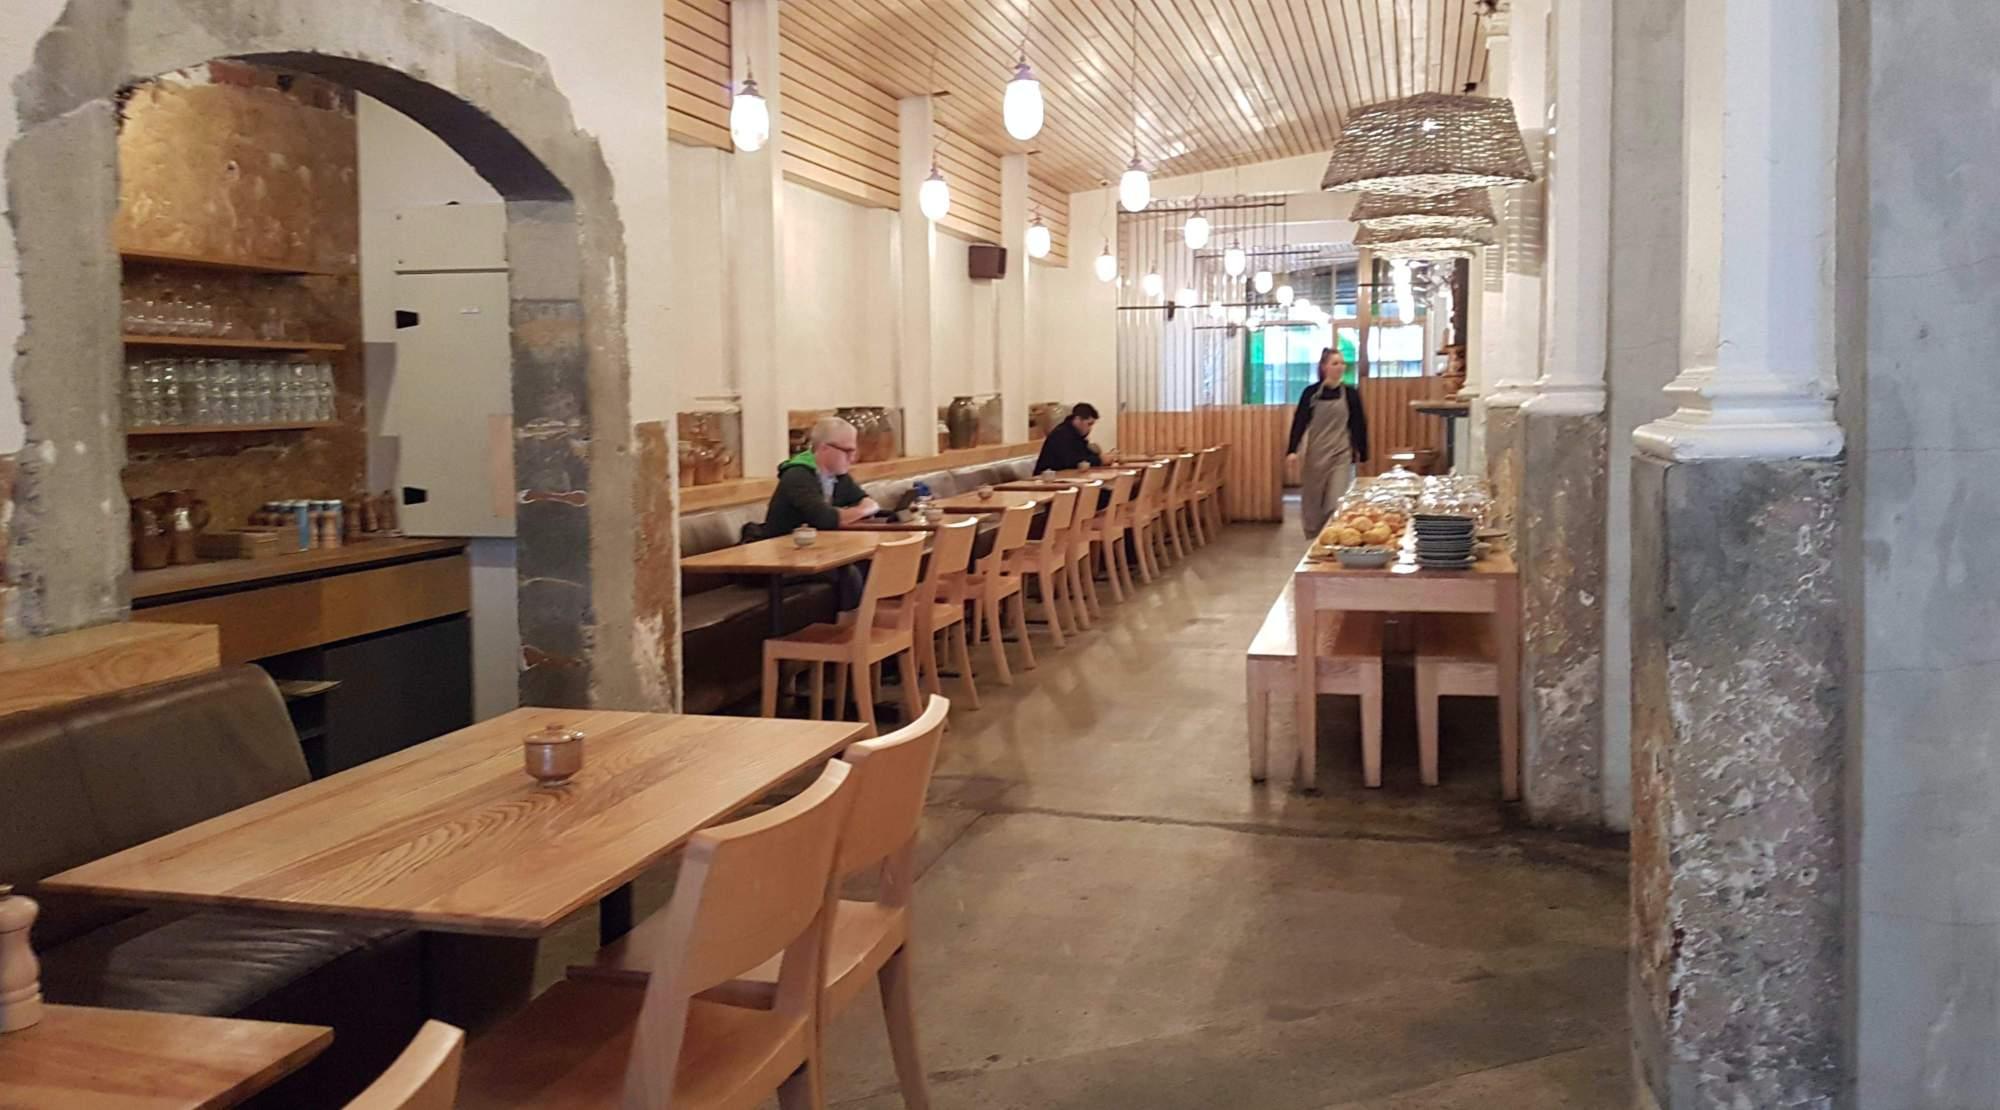 Loretta eatery interior long shot